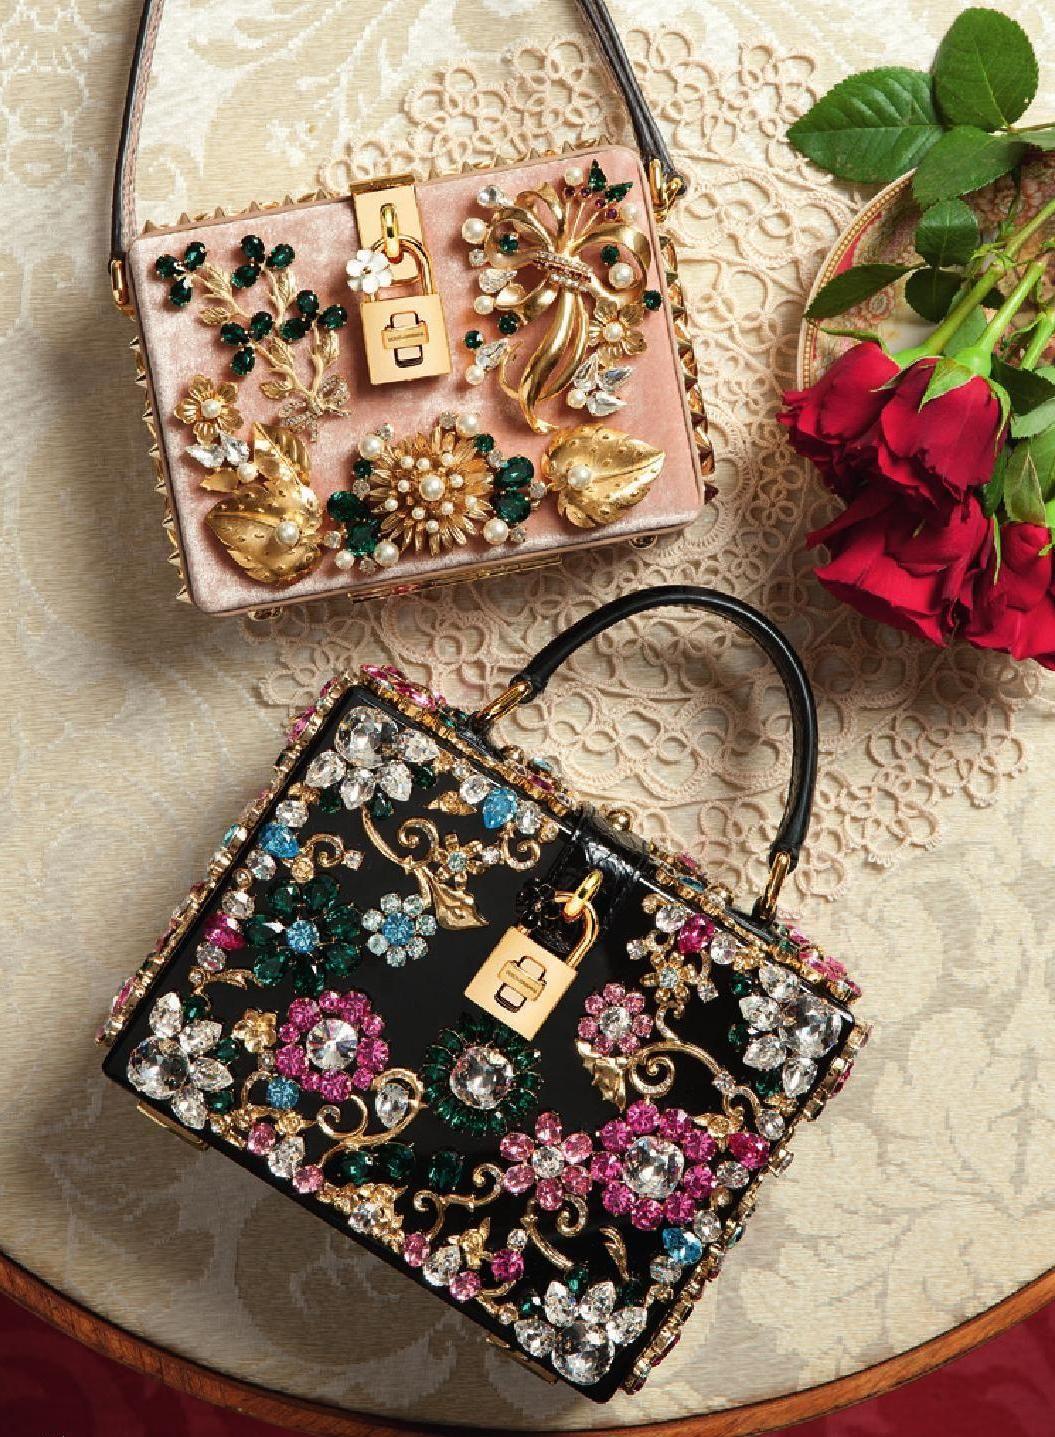 Winter 2016 Women's Accessories Catalogue #accessories